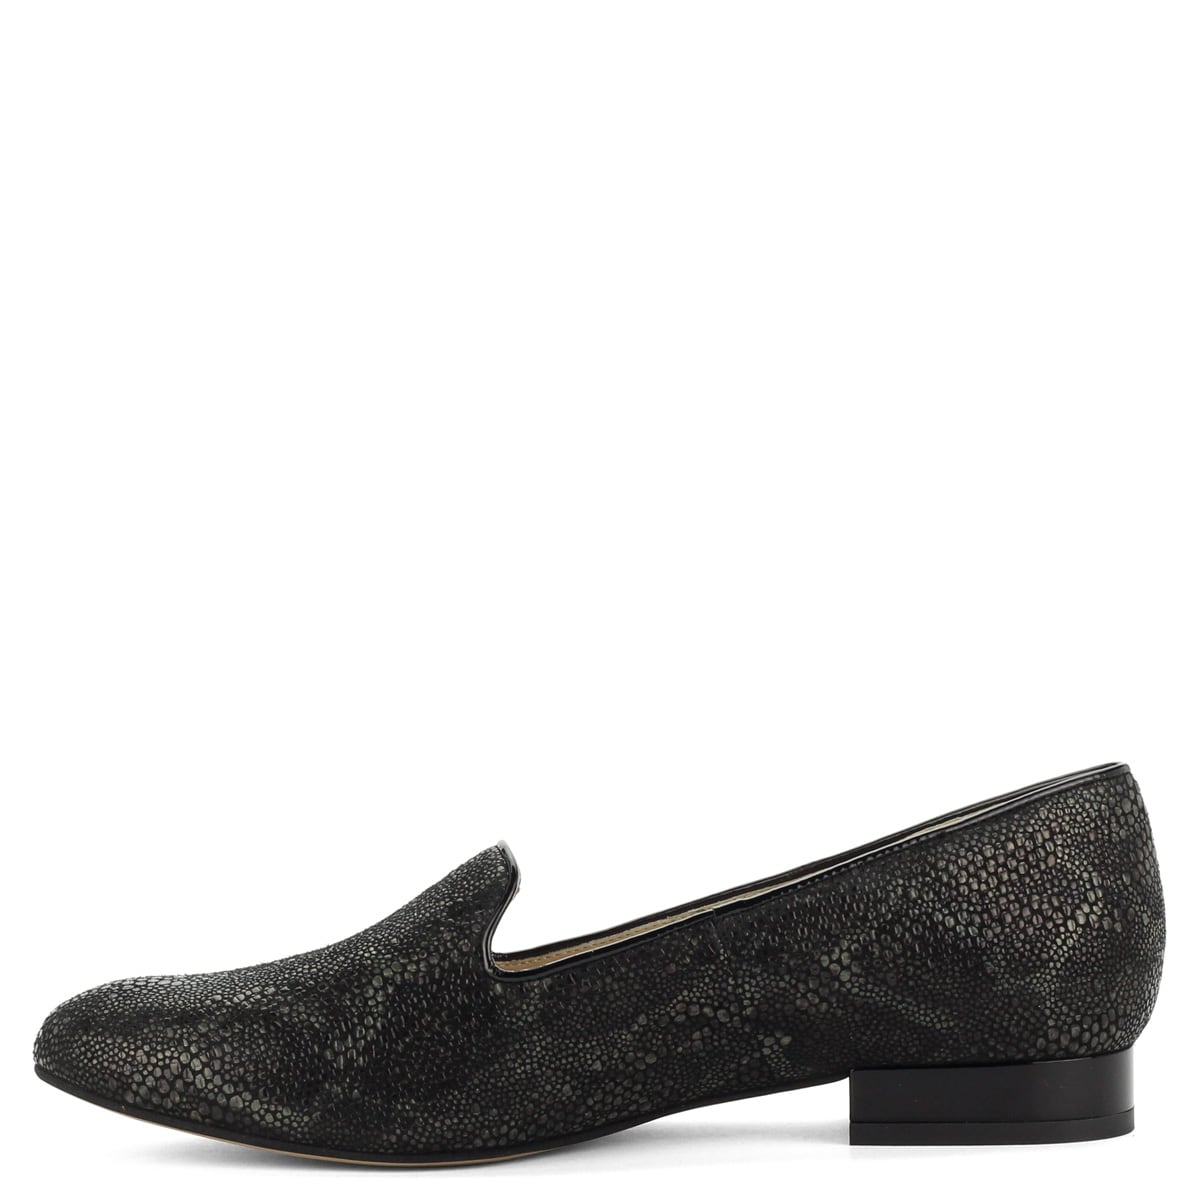 b37848a0d2 Anis lapos bőr cipő